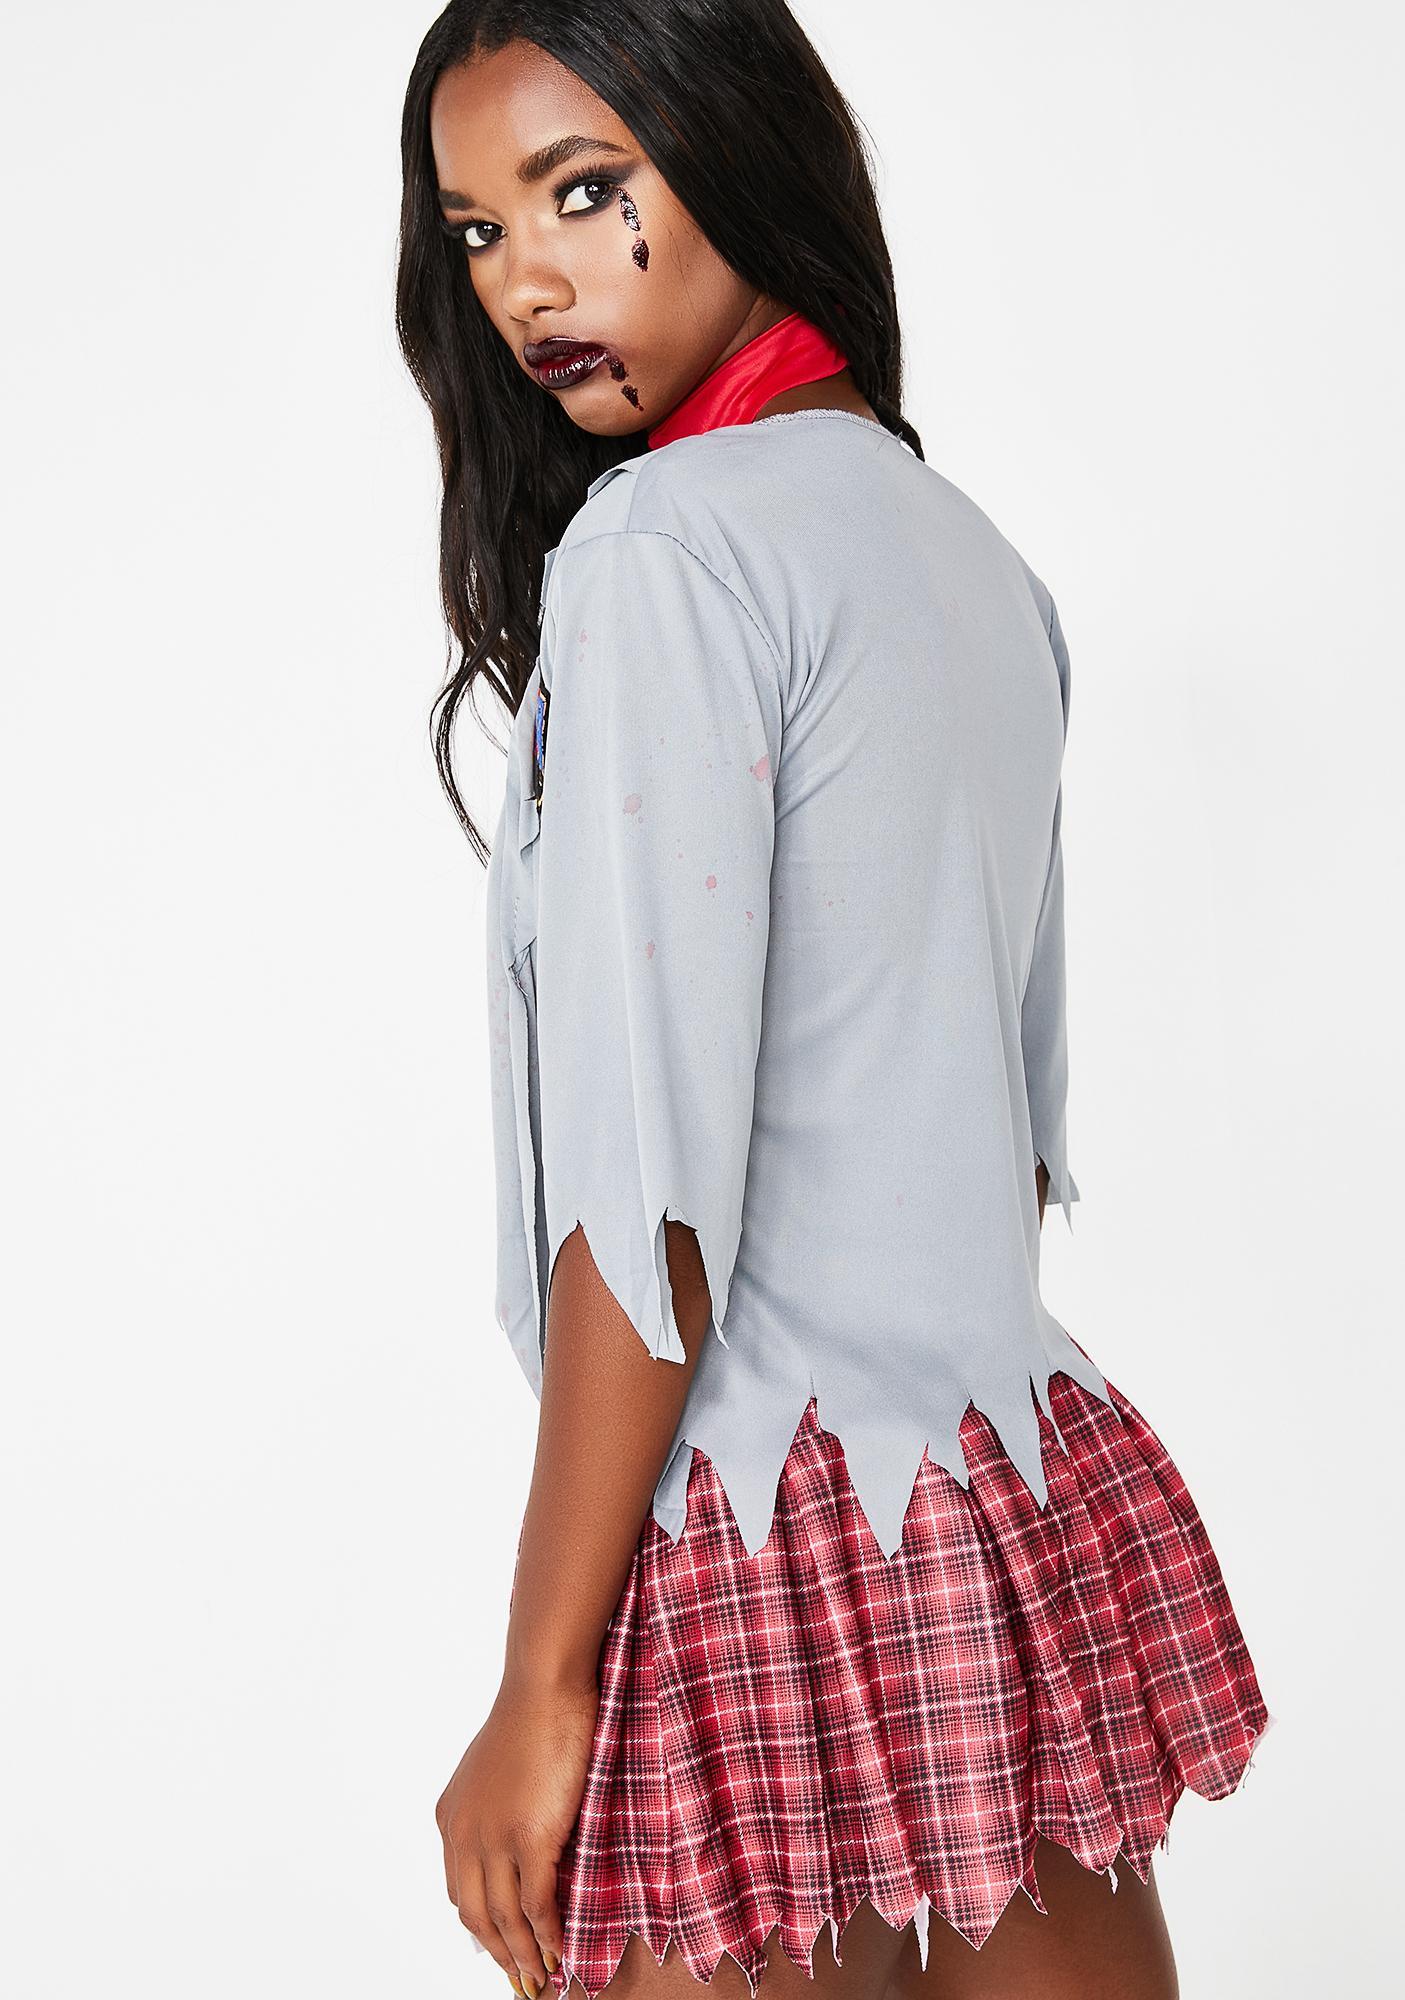 Schoolgirl Uniform Pattern Magnificent Decorating